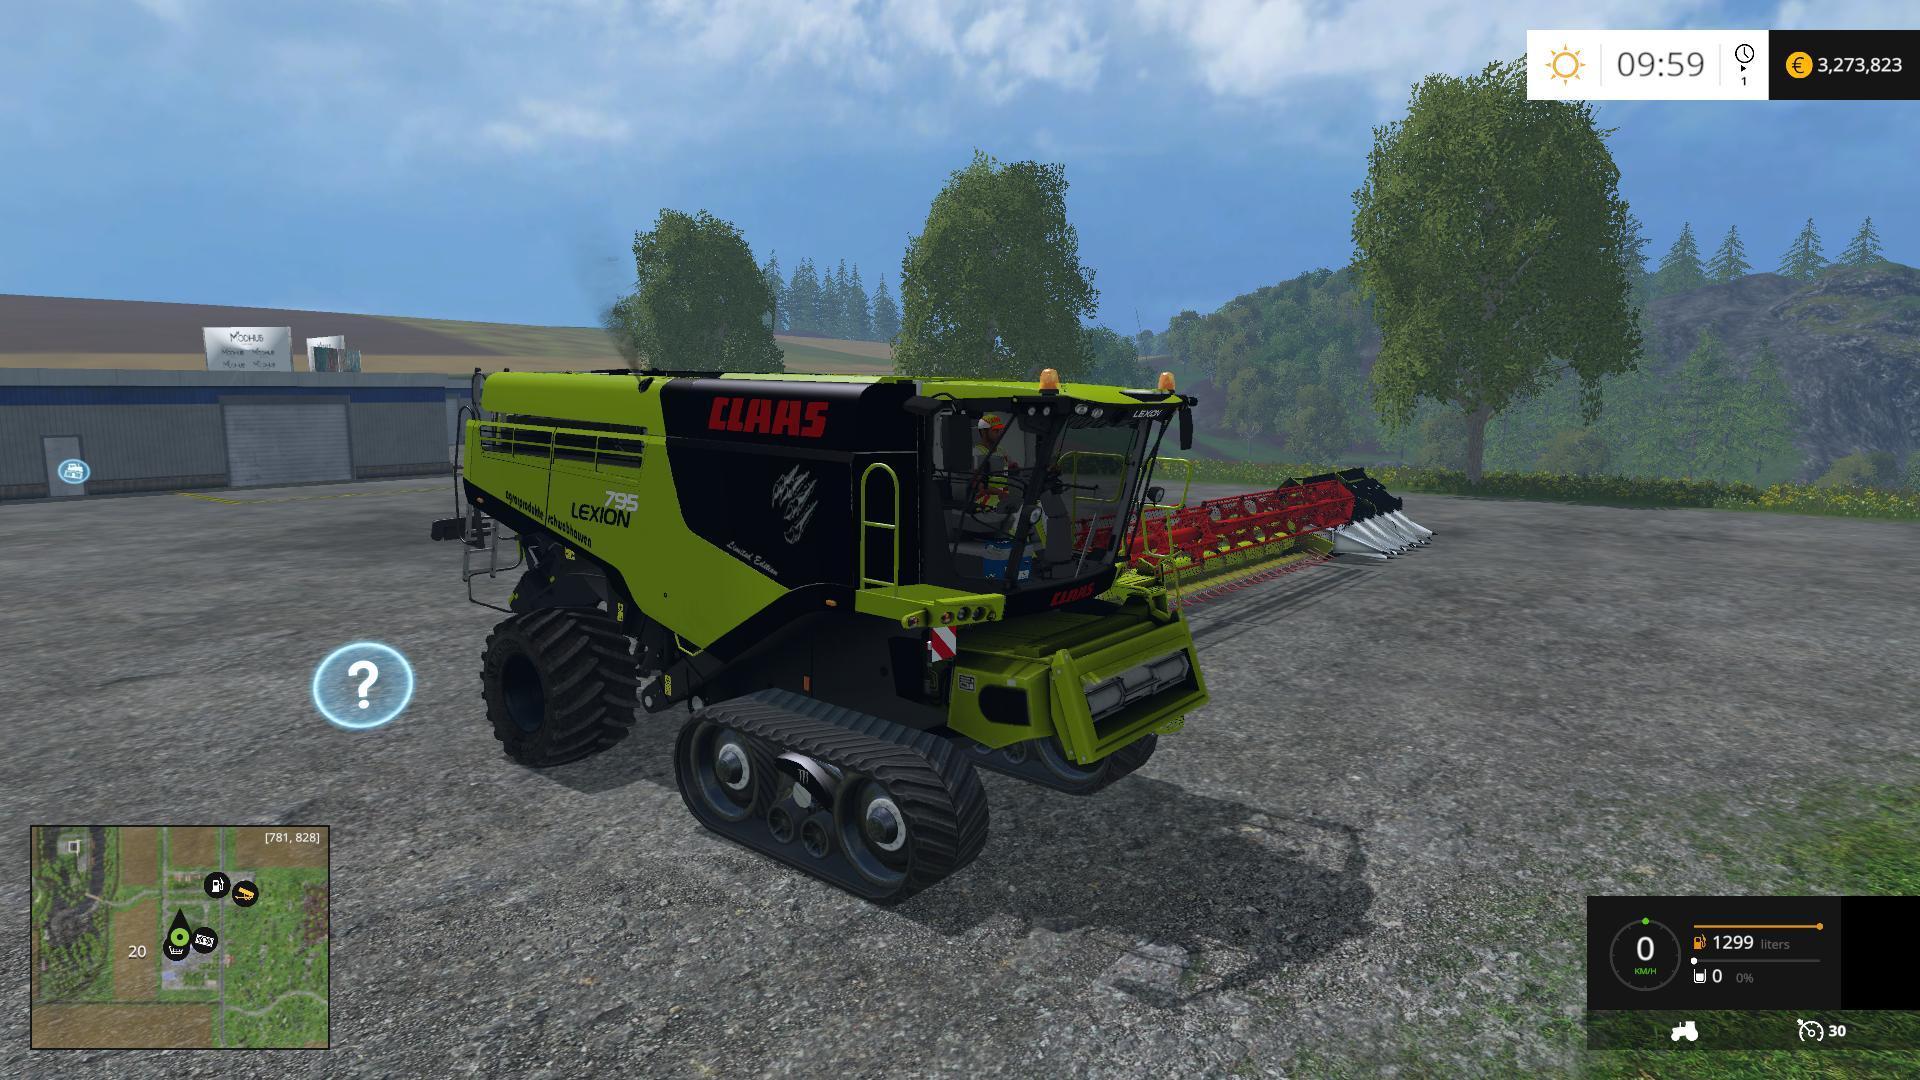 claas lexion 795 v1 0 farming simulator 17 19 mods fs17 19 mods. Black Bedroom Furniture Sets. Home Design Ideas